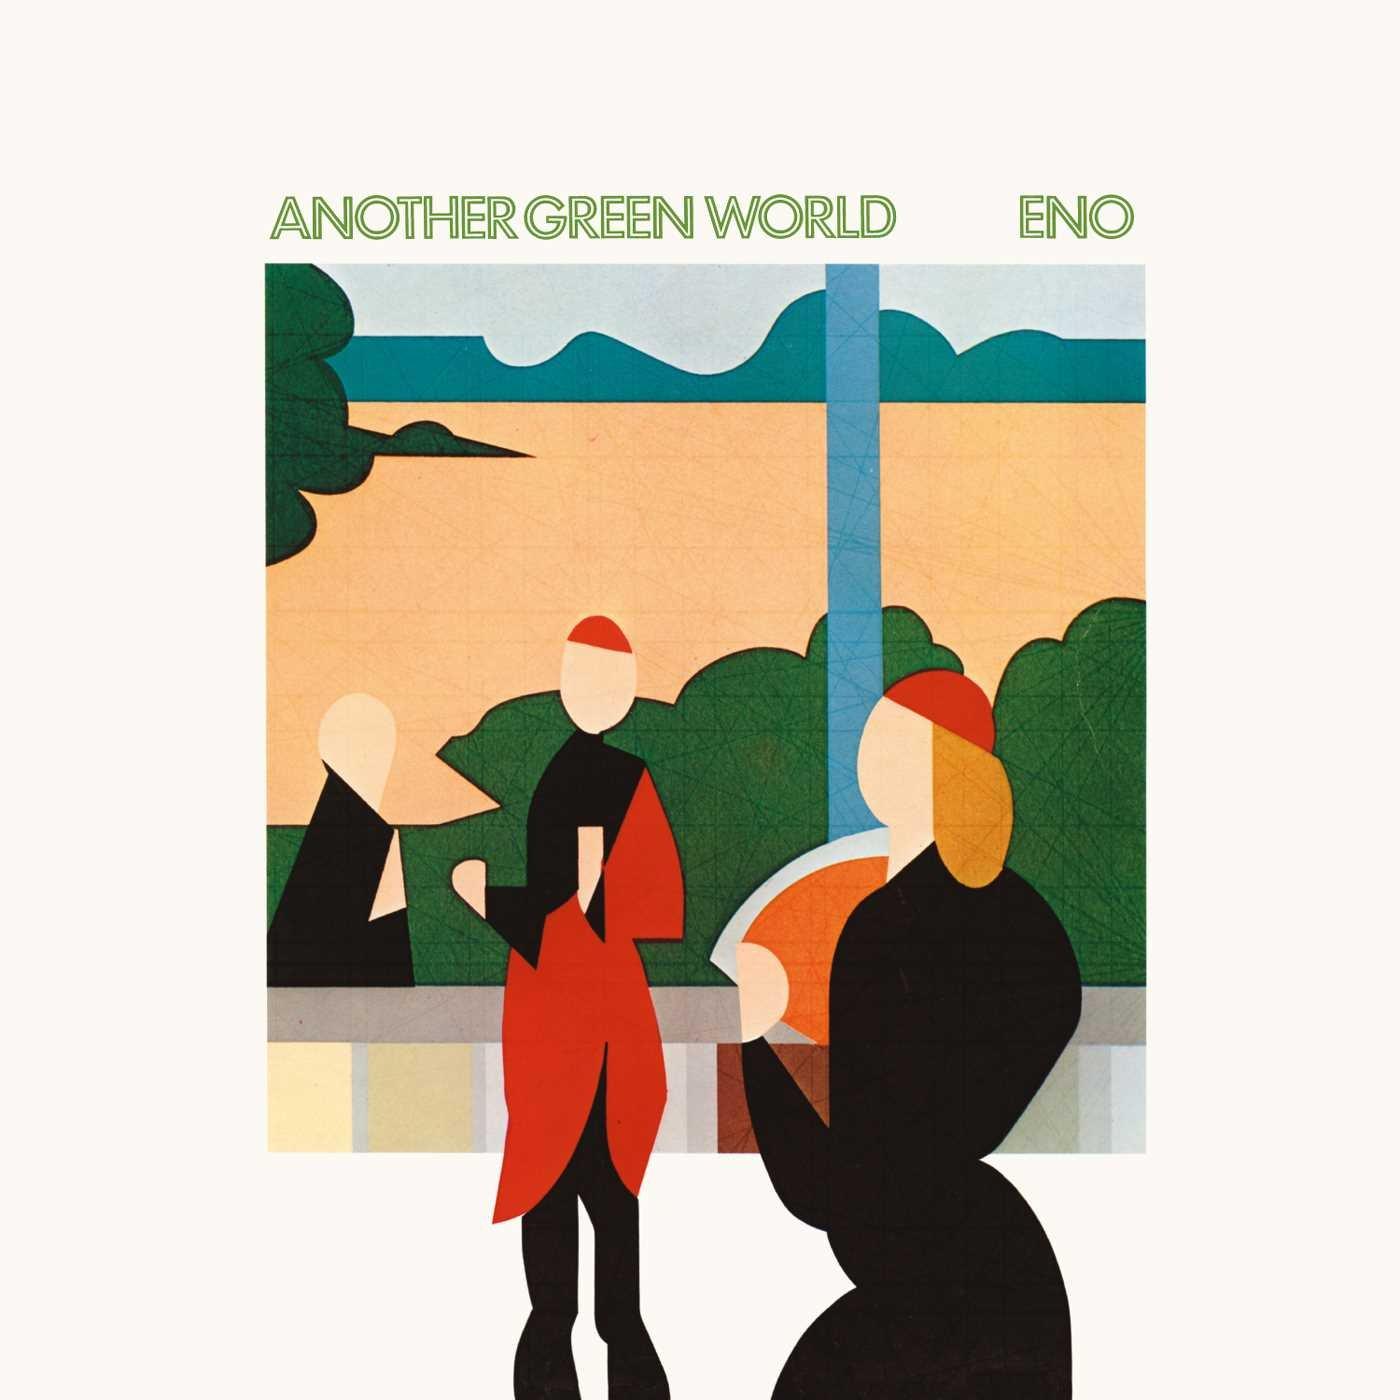 Another Green World 180 gram Vinyl by Brian Eno £9.99 @ Amazon (+£2.99 Non-prime)